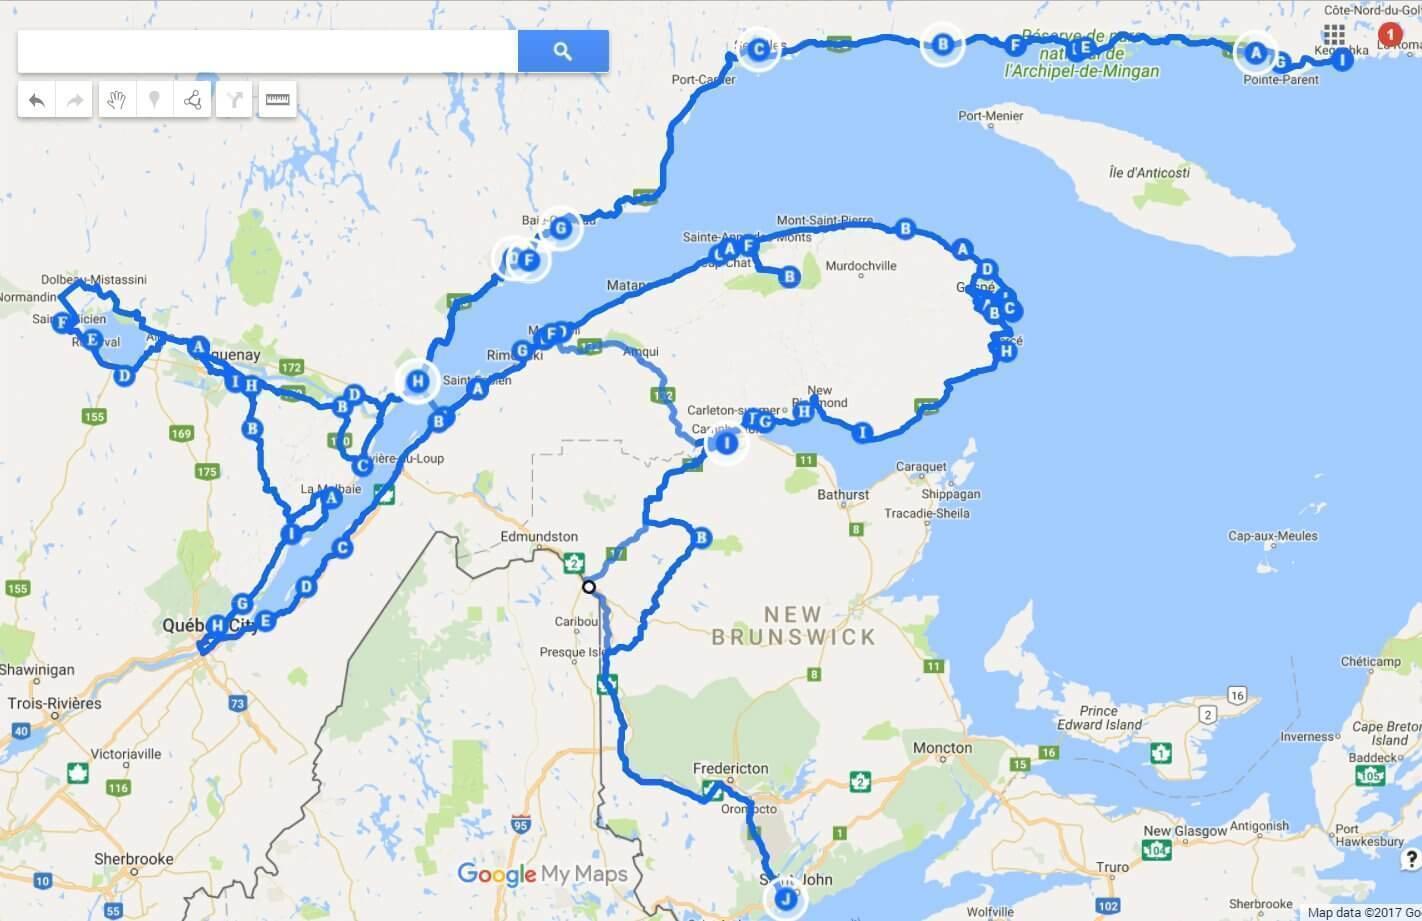 Our RV route through Quebec Maritime